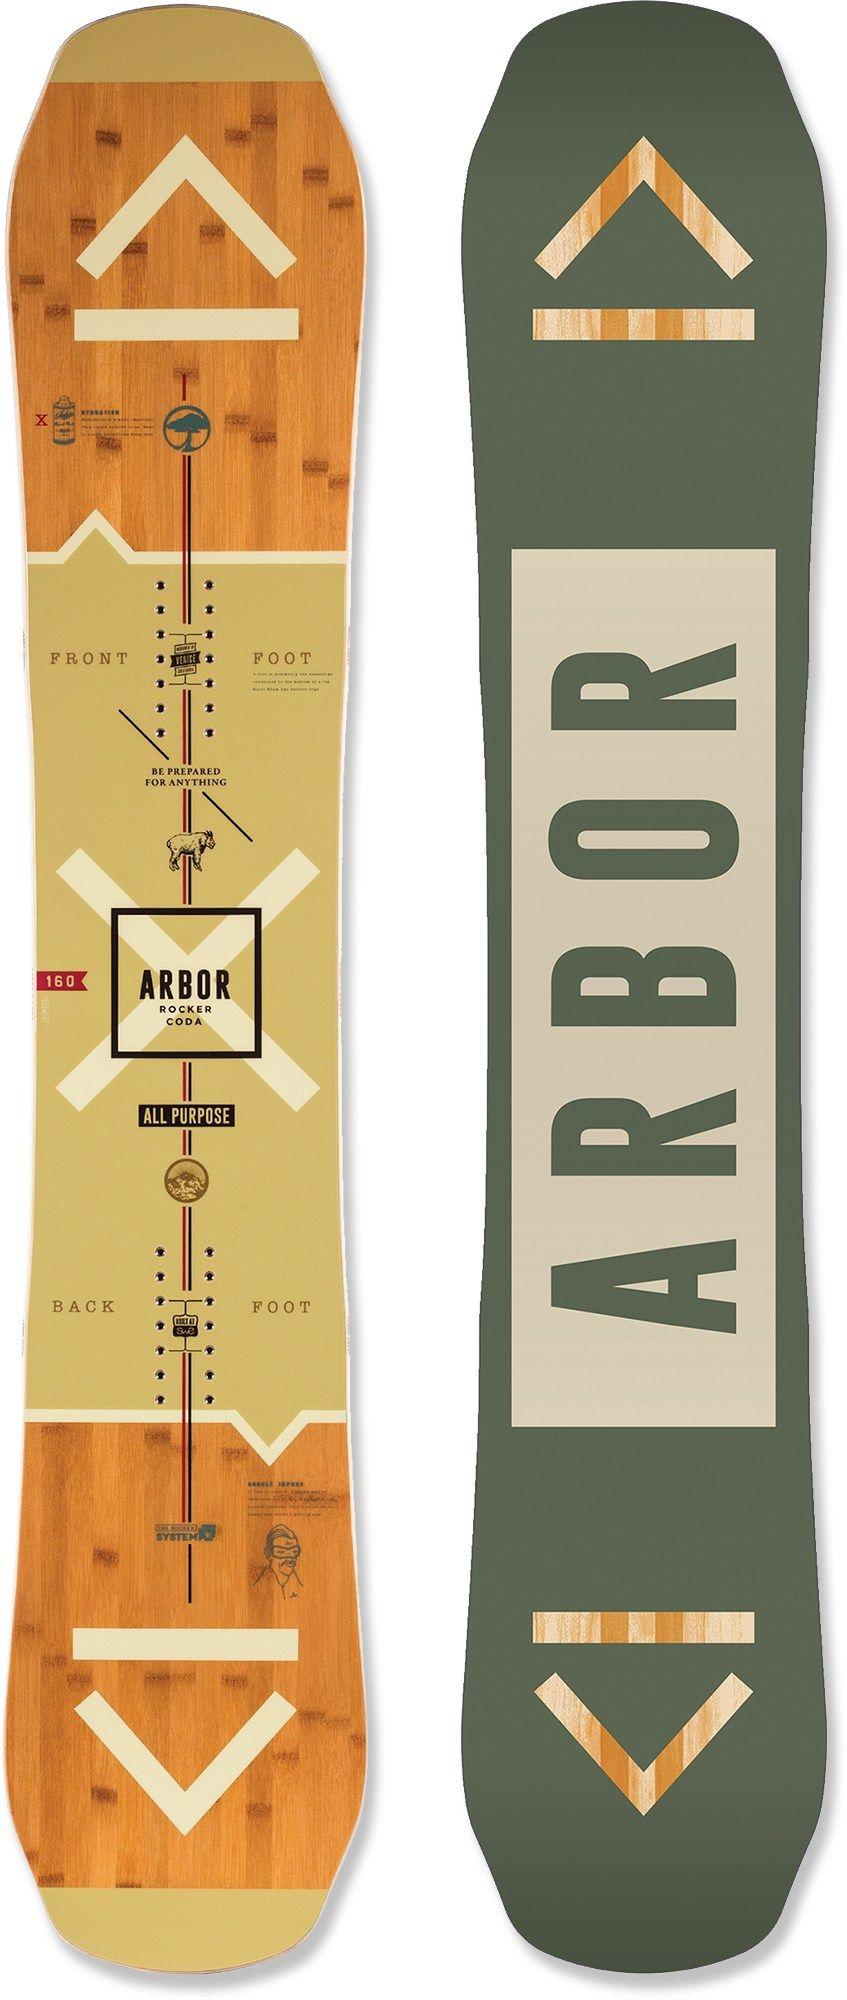 Arbor snowboards for sale canada